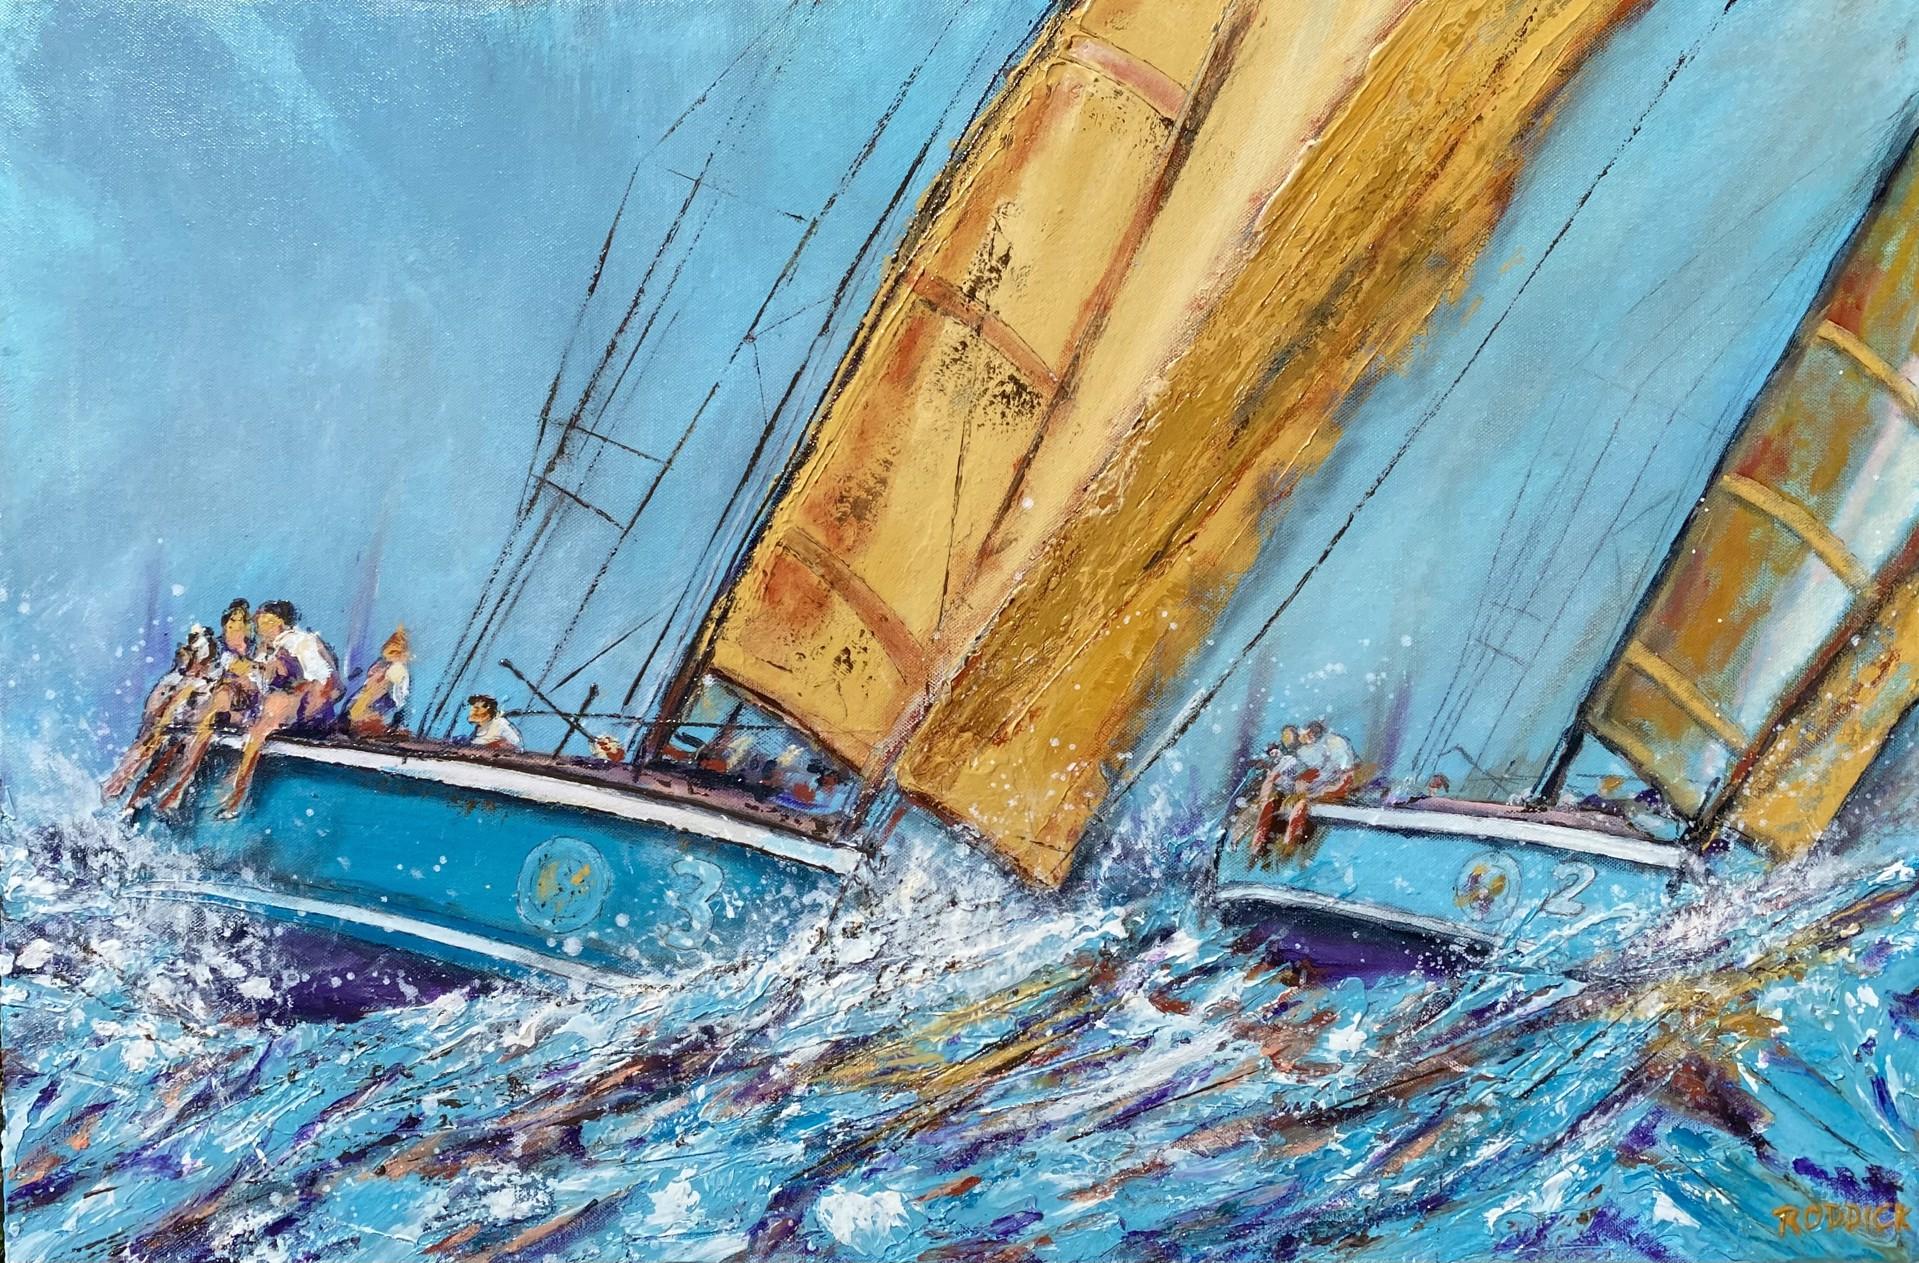 Mar Em Motions by Christopher Roddick